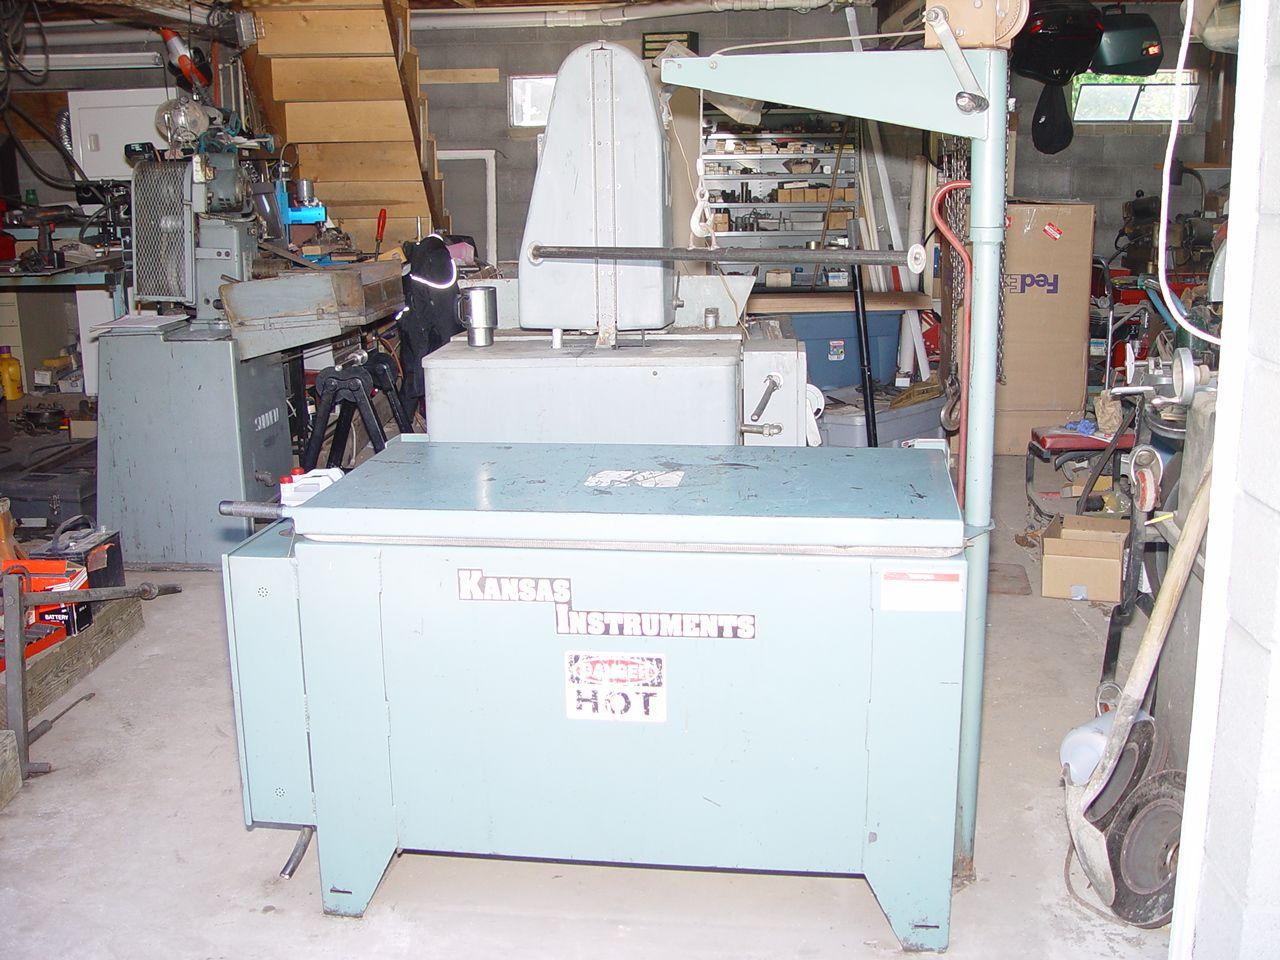 Kansas Instruments HO800 Oven | Used Engine Rebuilding Equipment